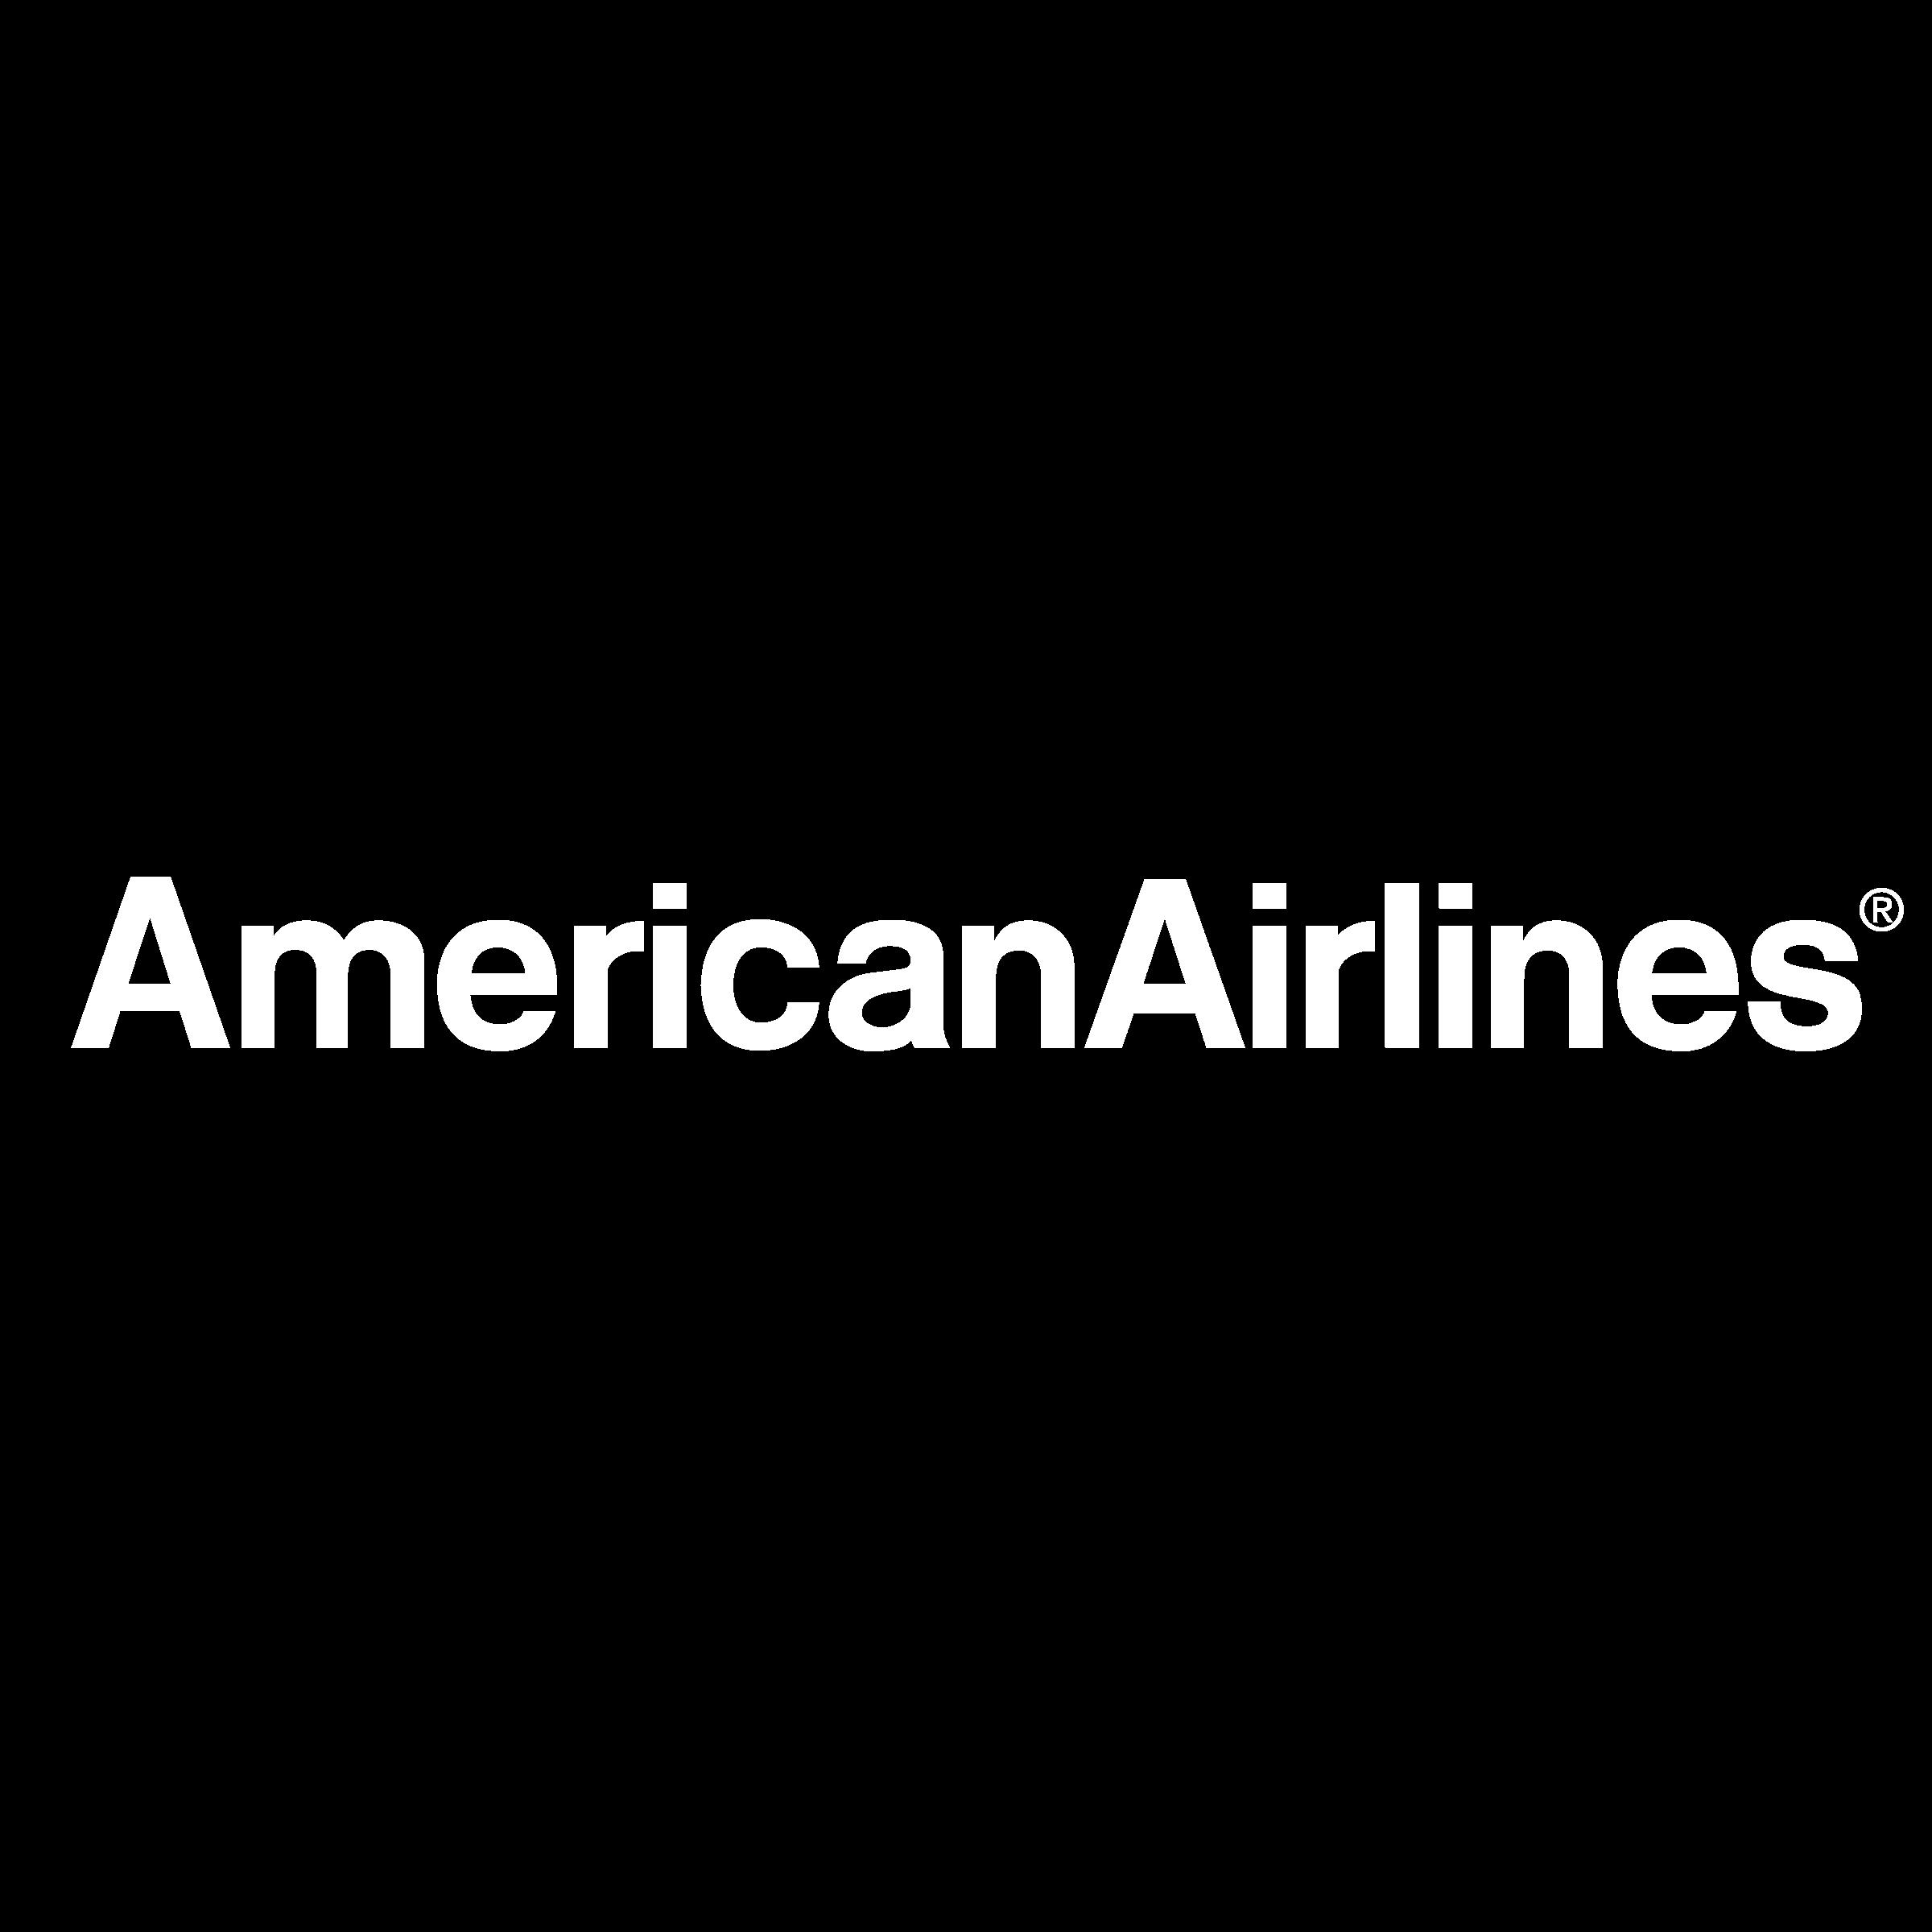 American Airlines Logo Png Transparent Amp Svg Vector